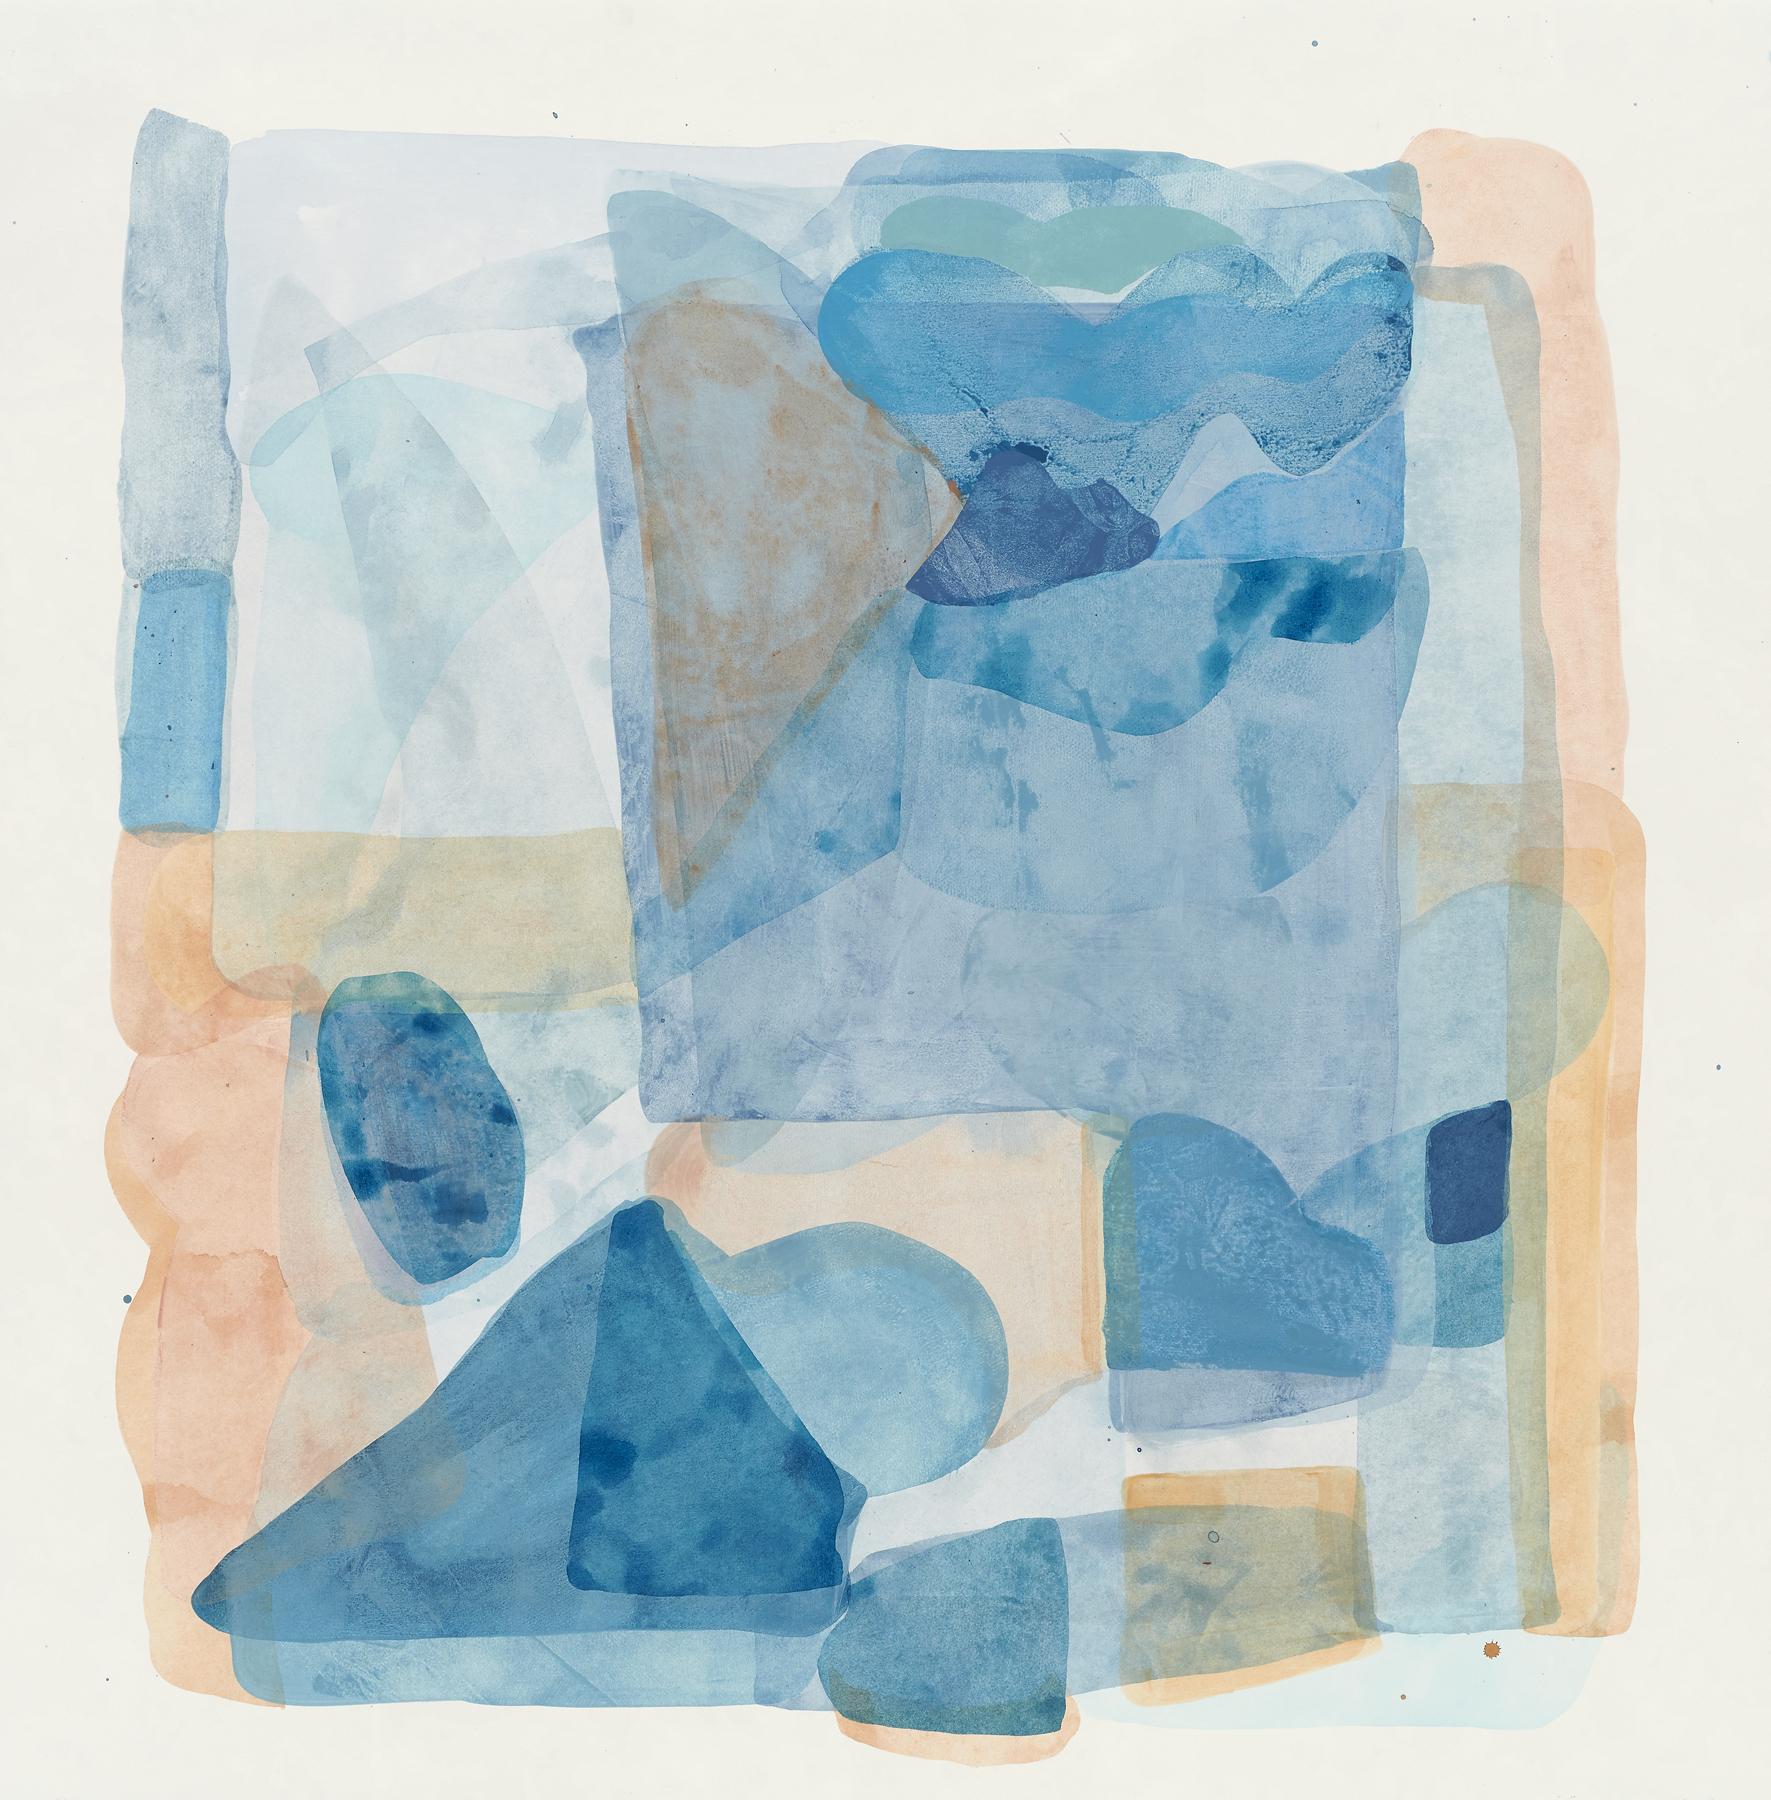 "Light Blue-5, 2019, mixed media on paper, 28.5 x 28"""